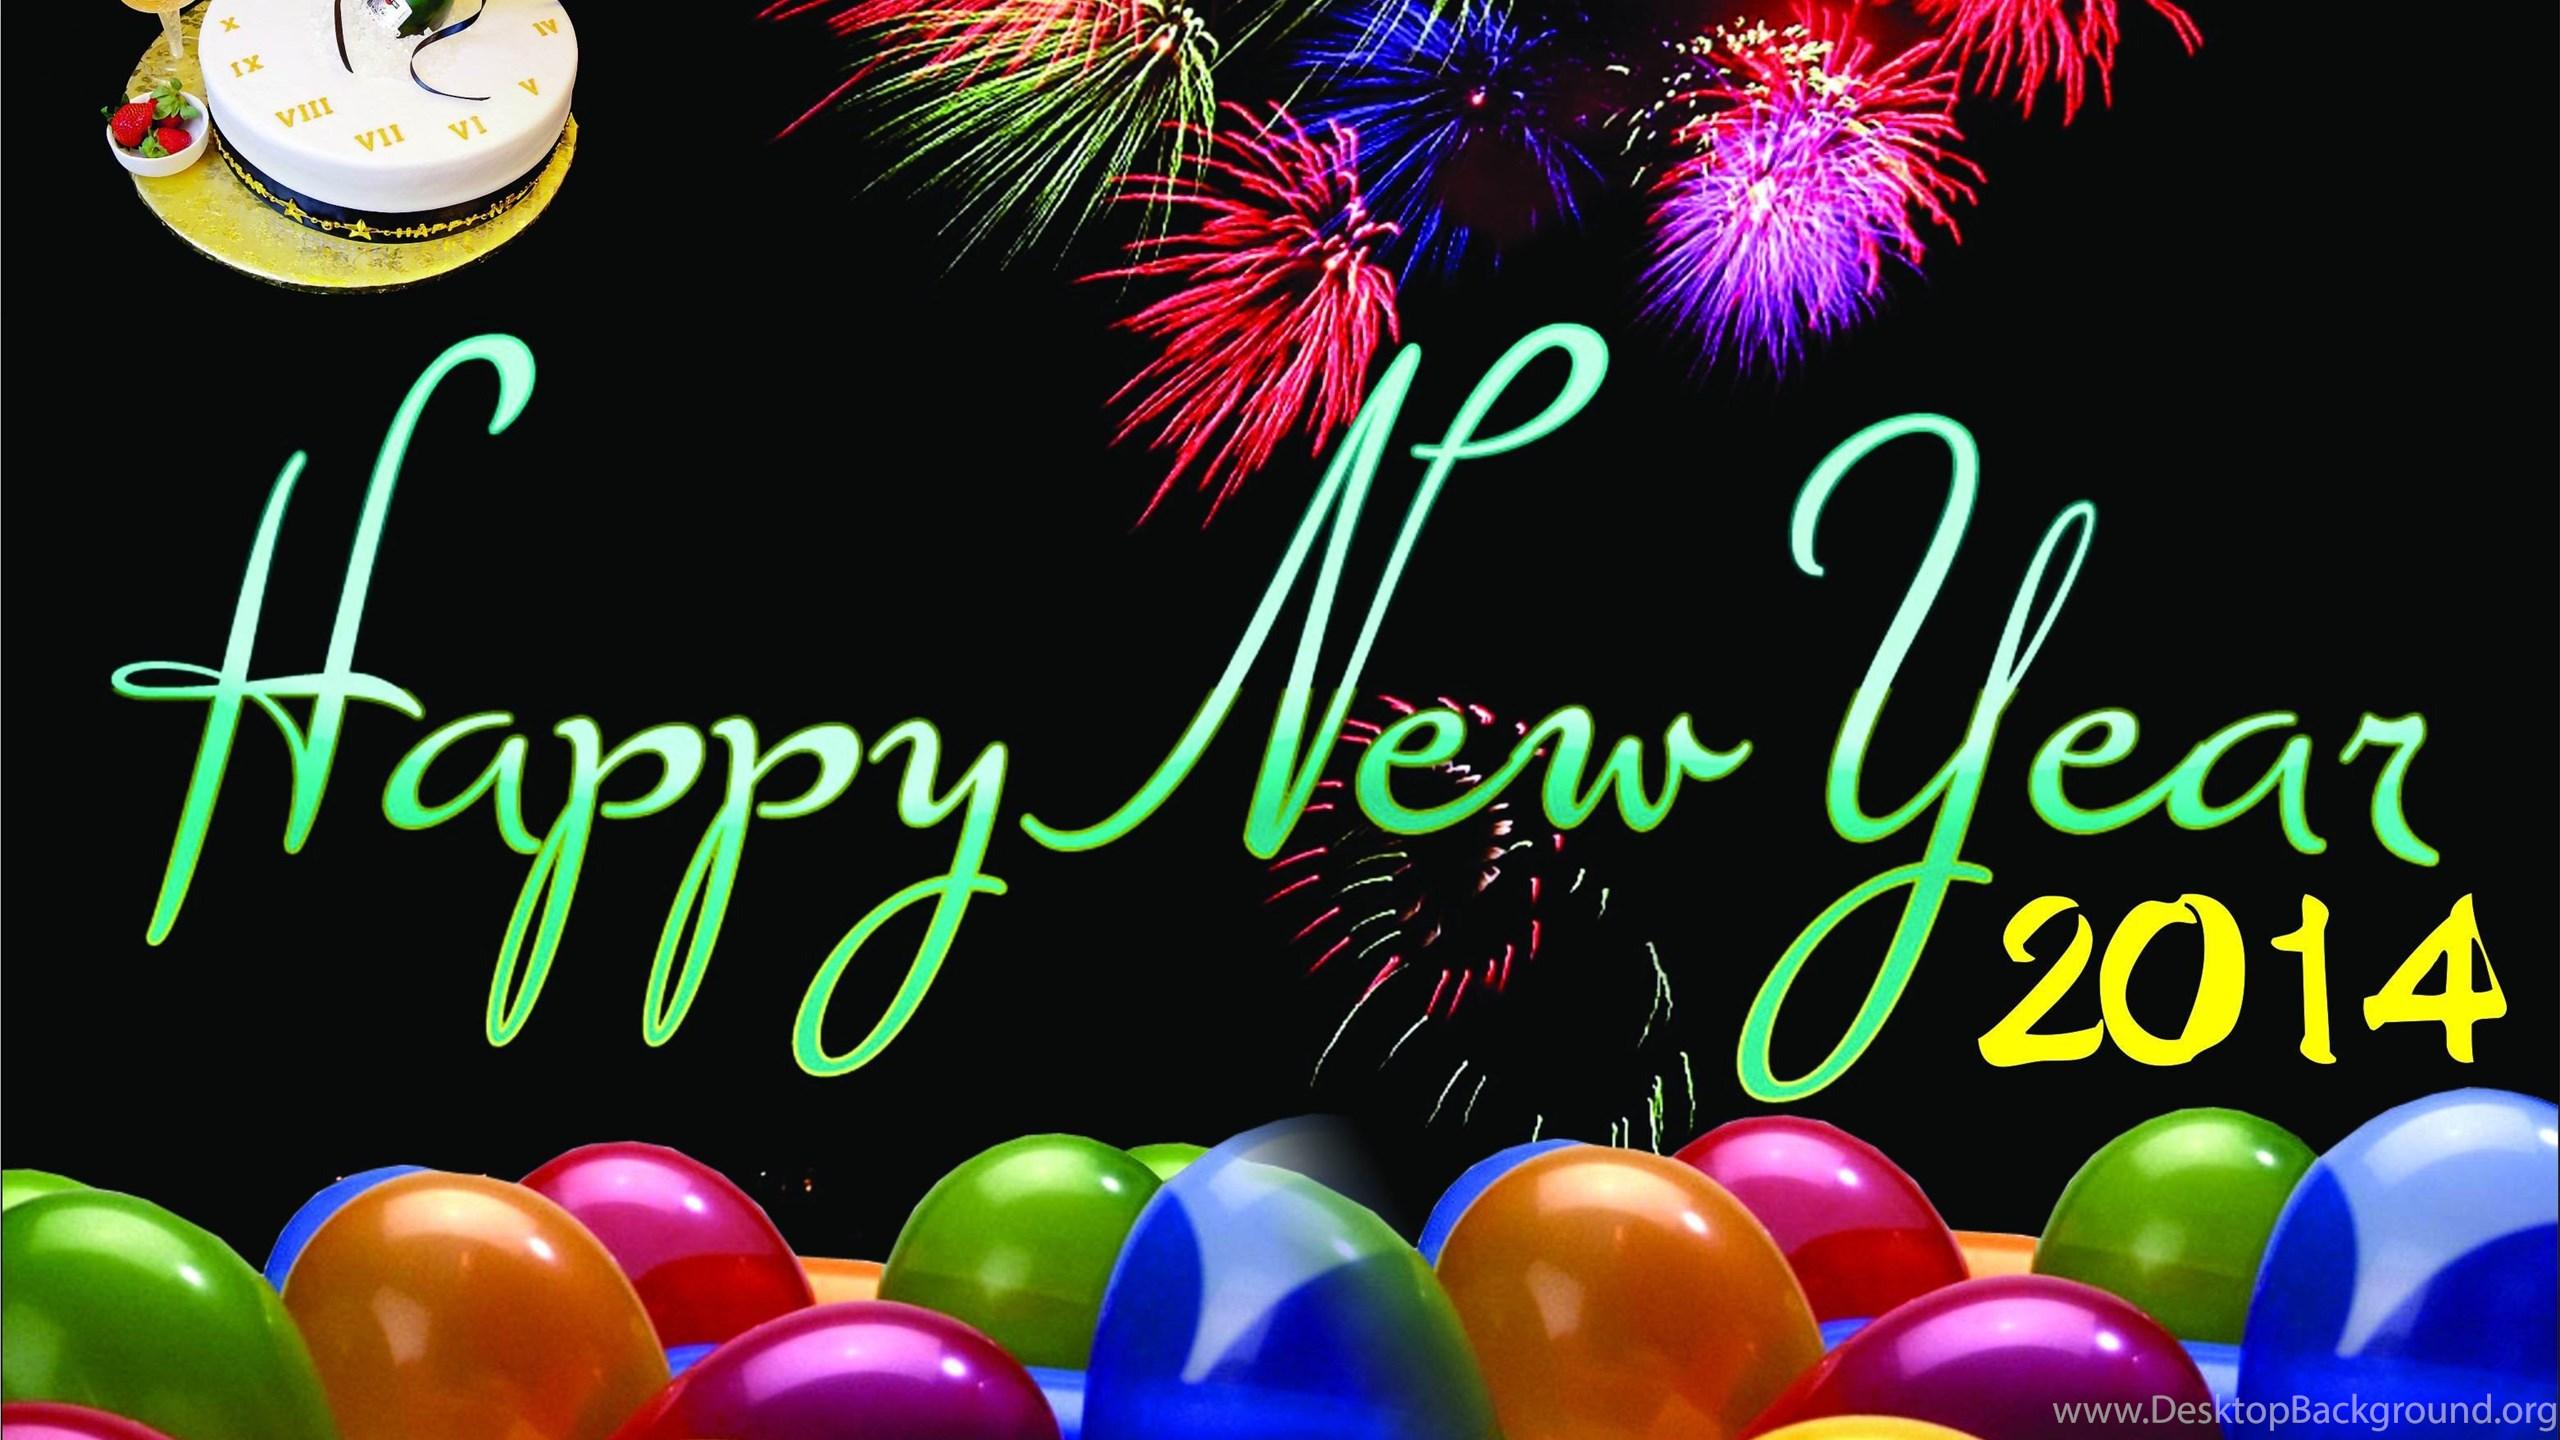 happy new year 2014 greetings44 hd desktop wallpapers desktop background